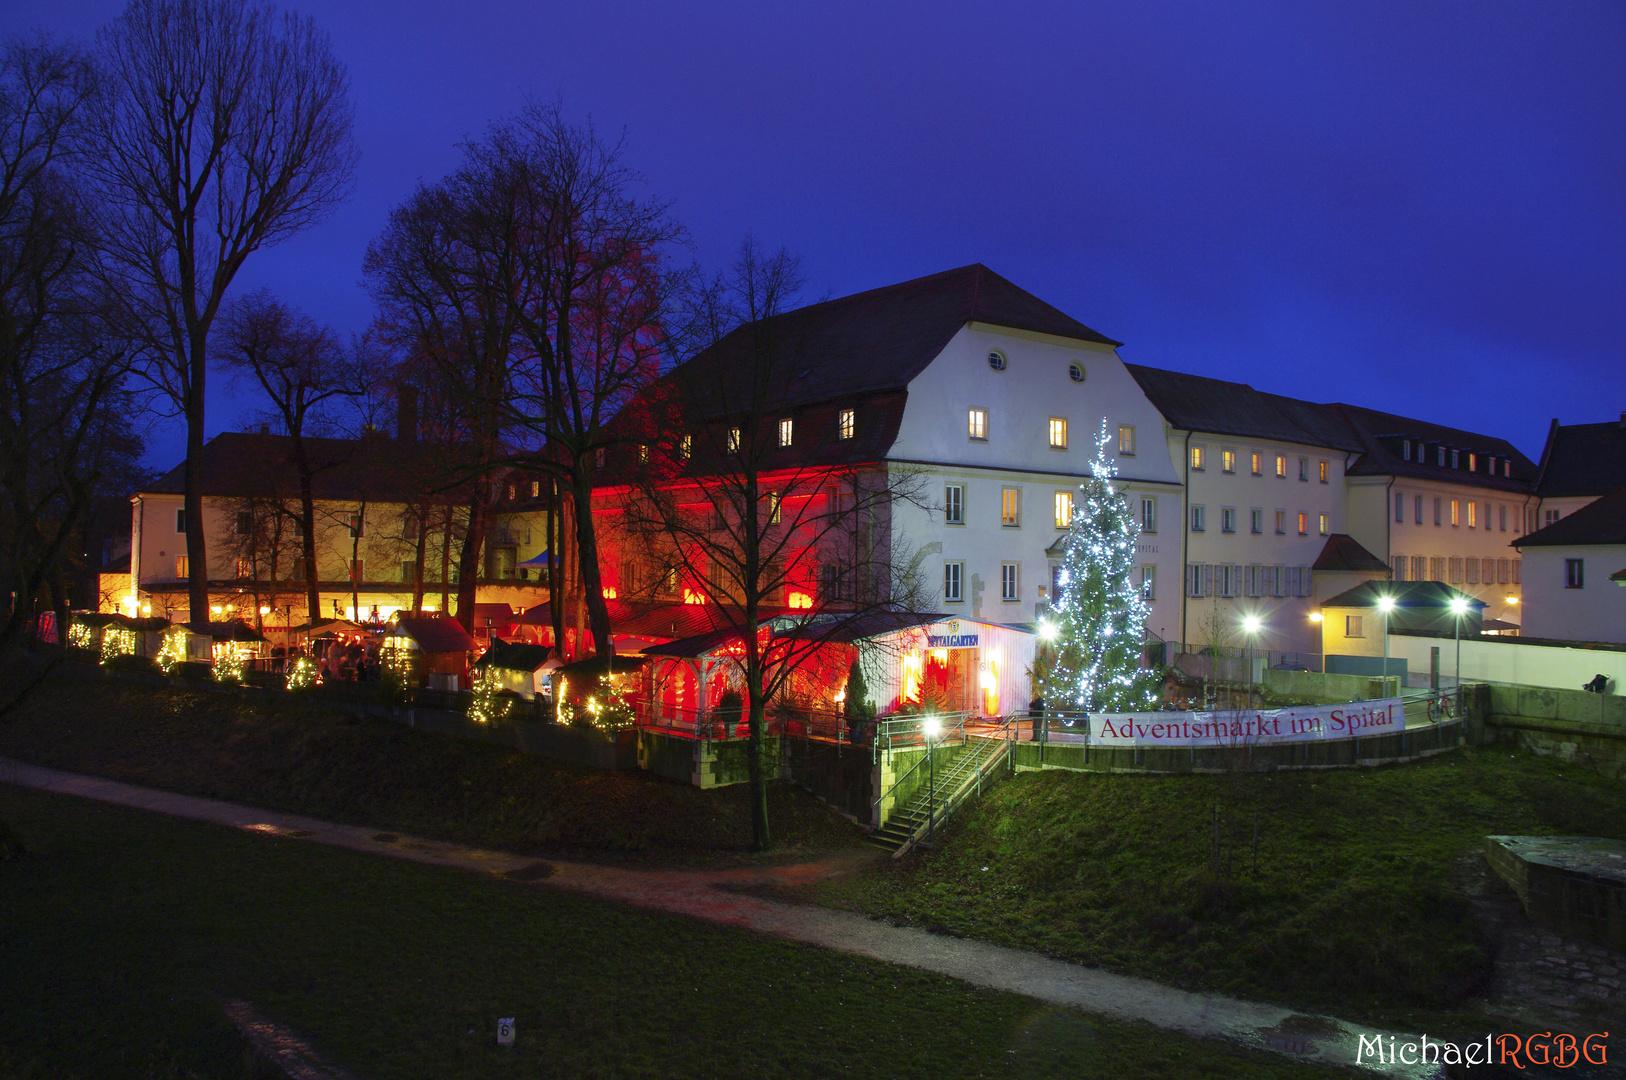 Christkindlmarkt Spitalgarten Regensburg